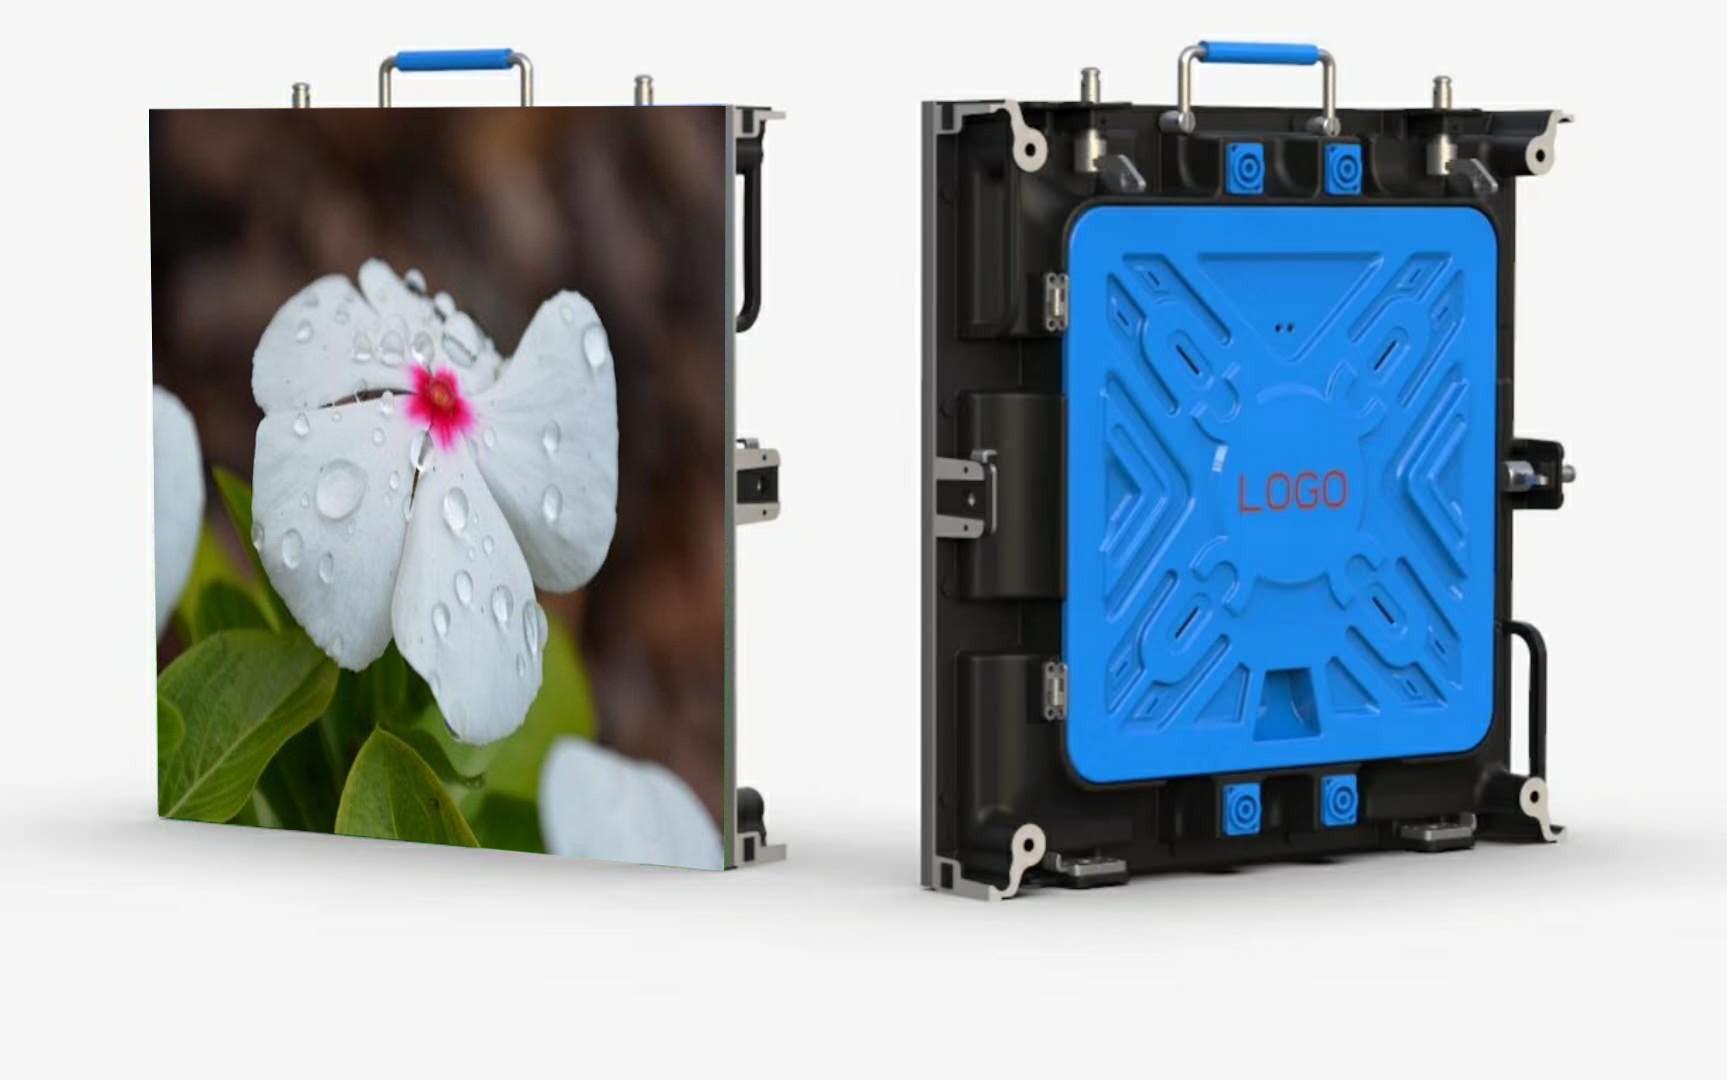 HD LED P2 indoor display screen Manufacturers, HD LED P2 indoor display screen Factory, Supply HD LED P2 indoor display screen